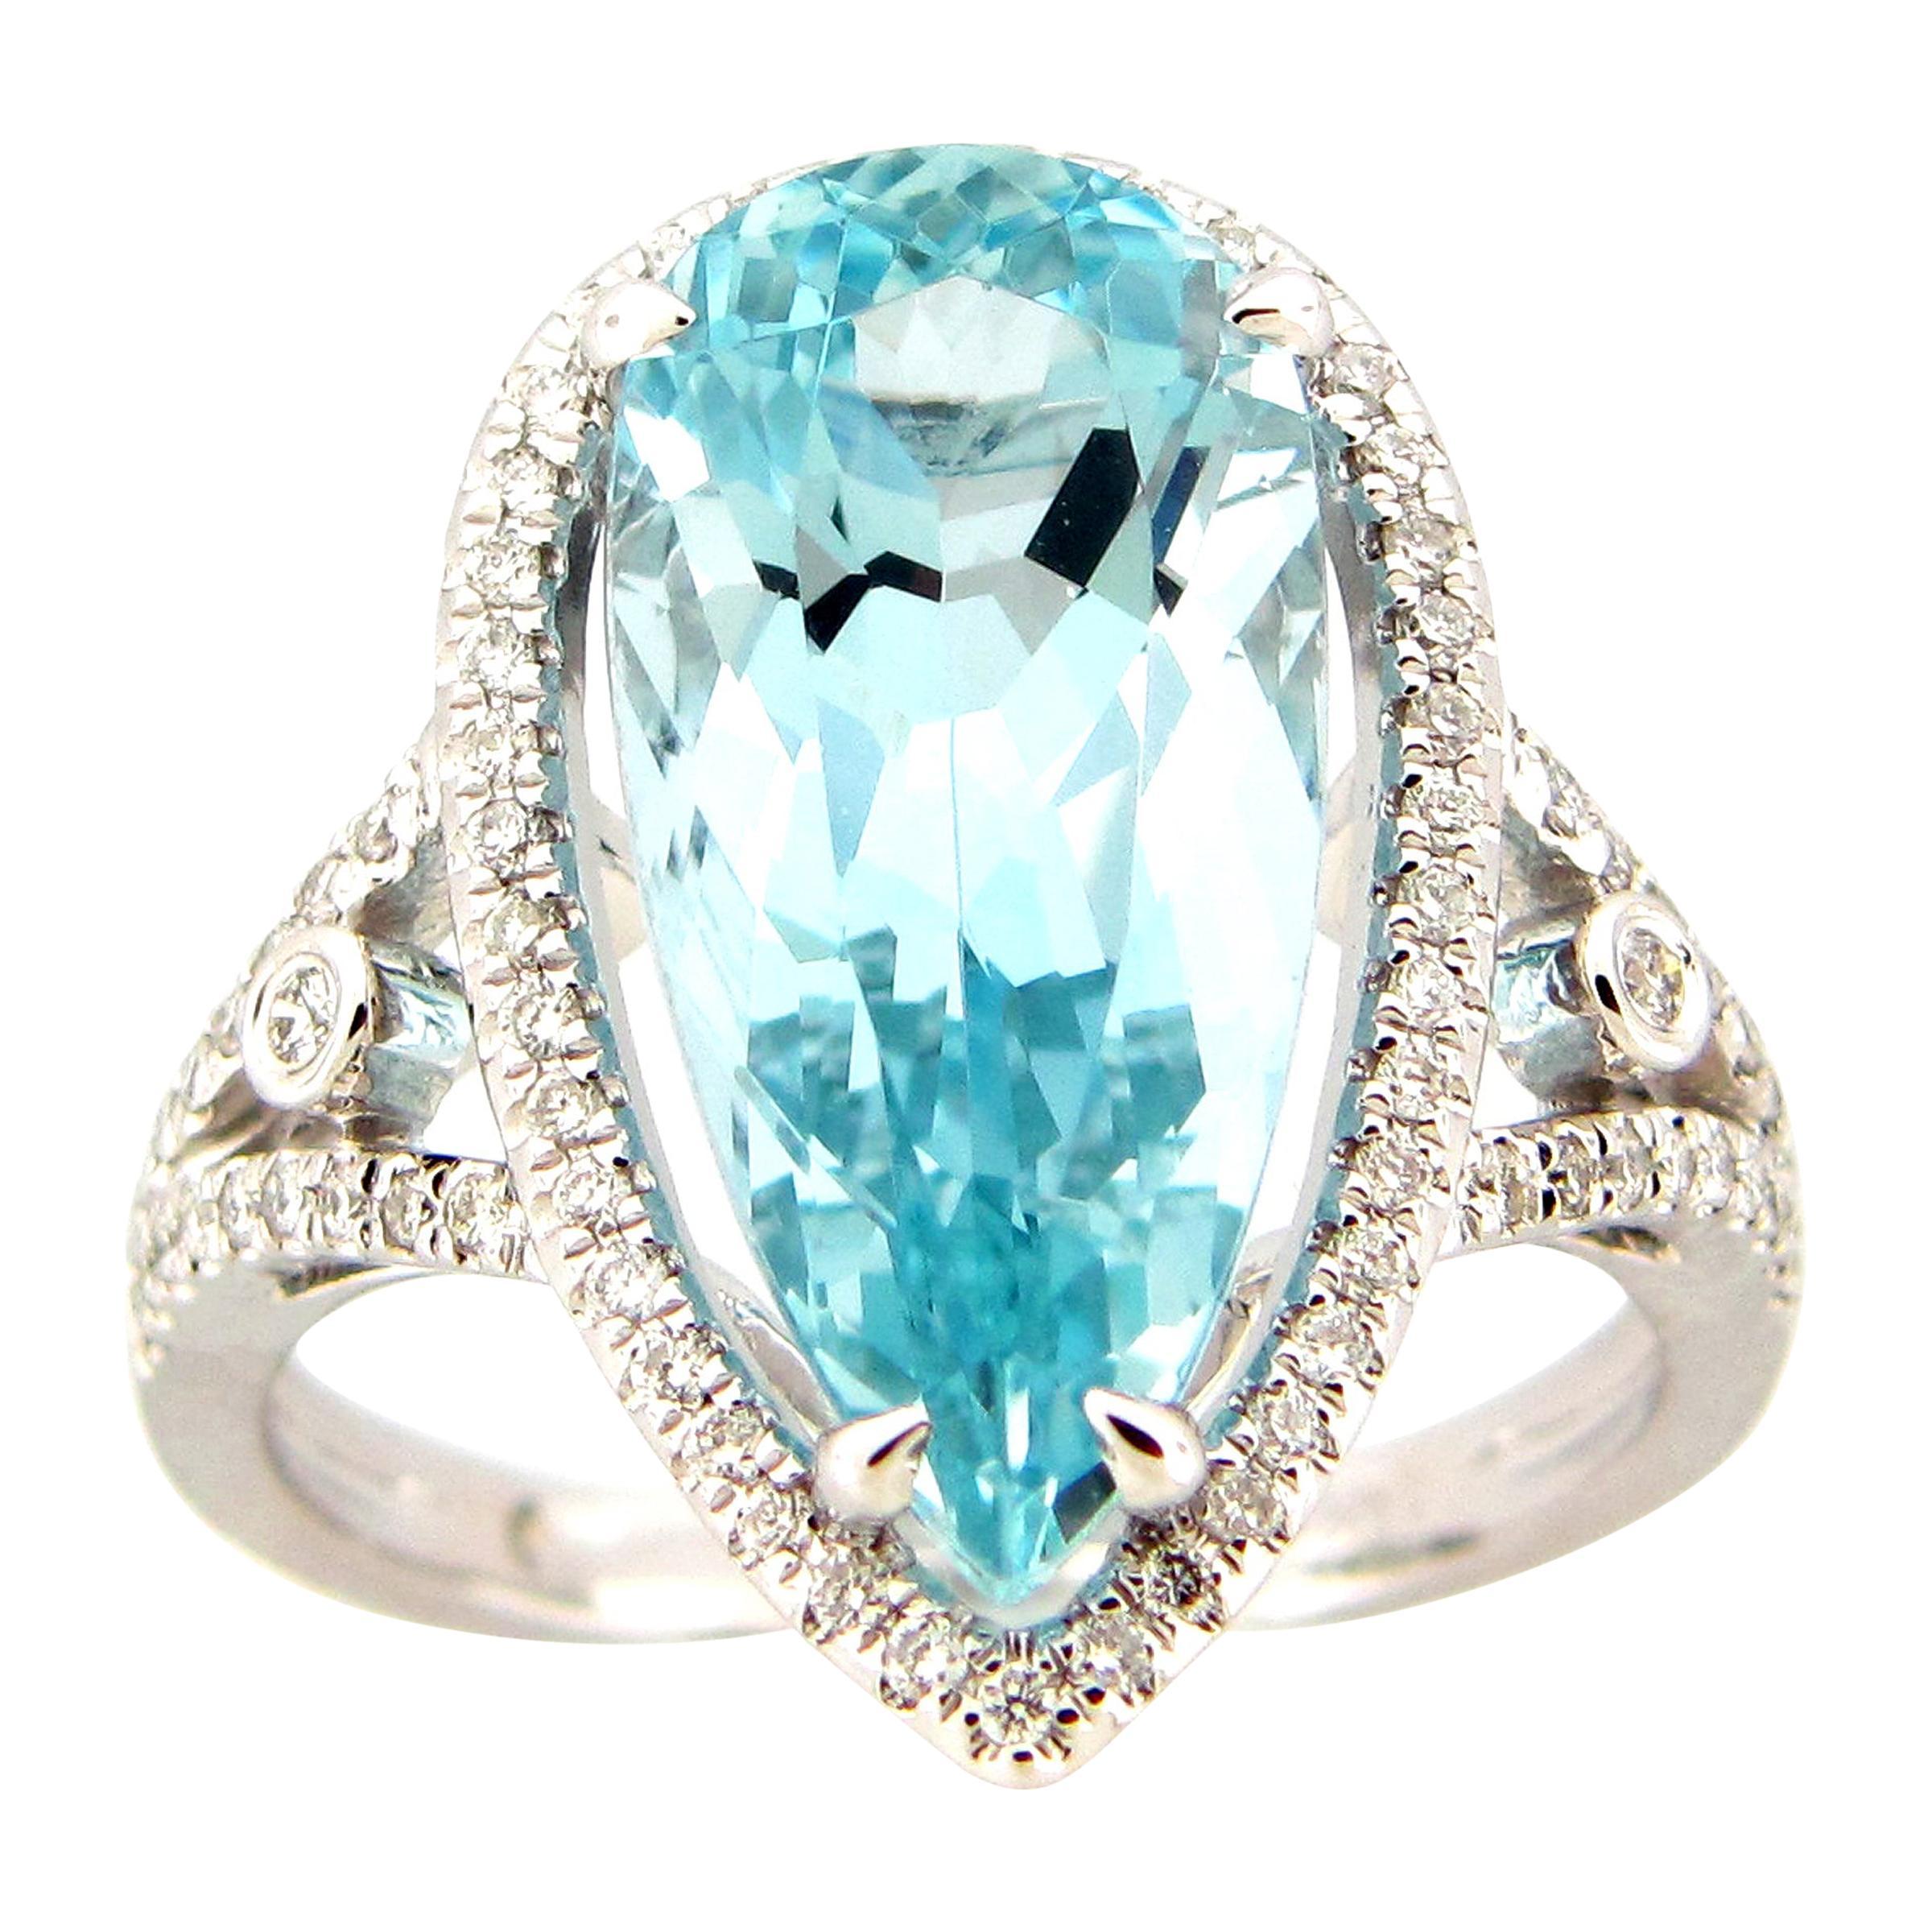 5.50 Pear Aquamarine and Diamond Cocktail Ring